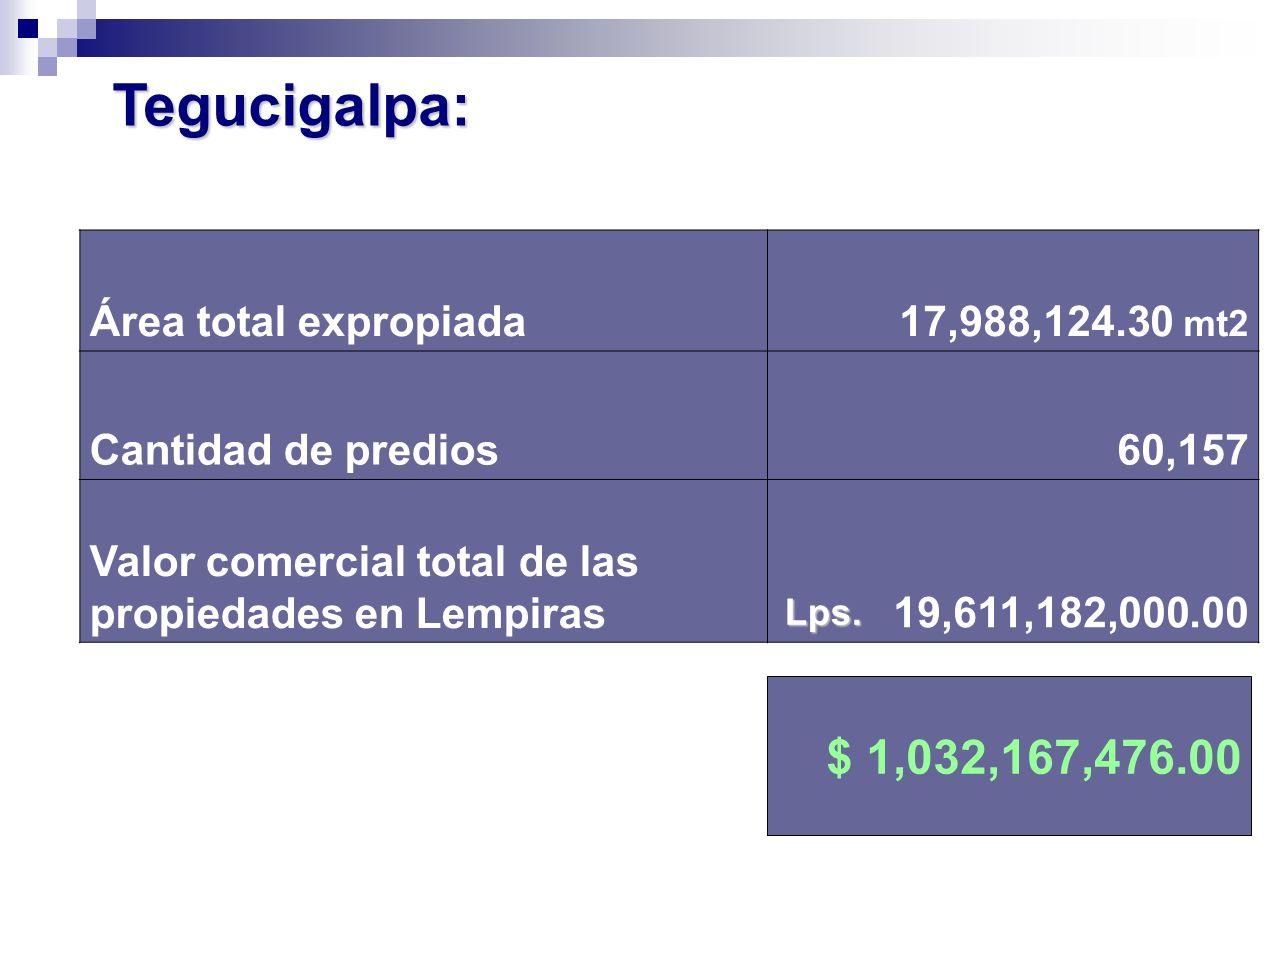 Área total expropiada17,988,124.30 mt2 Cantidad de predios60,157 Valor comercial total de las propiedades en Lempiras19,611,182,000.00 Lps. Tegucigalp